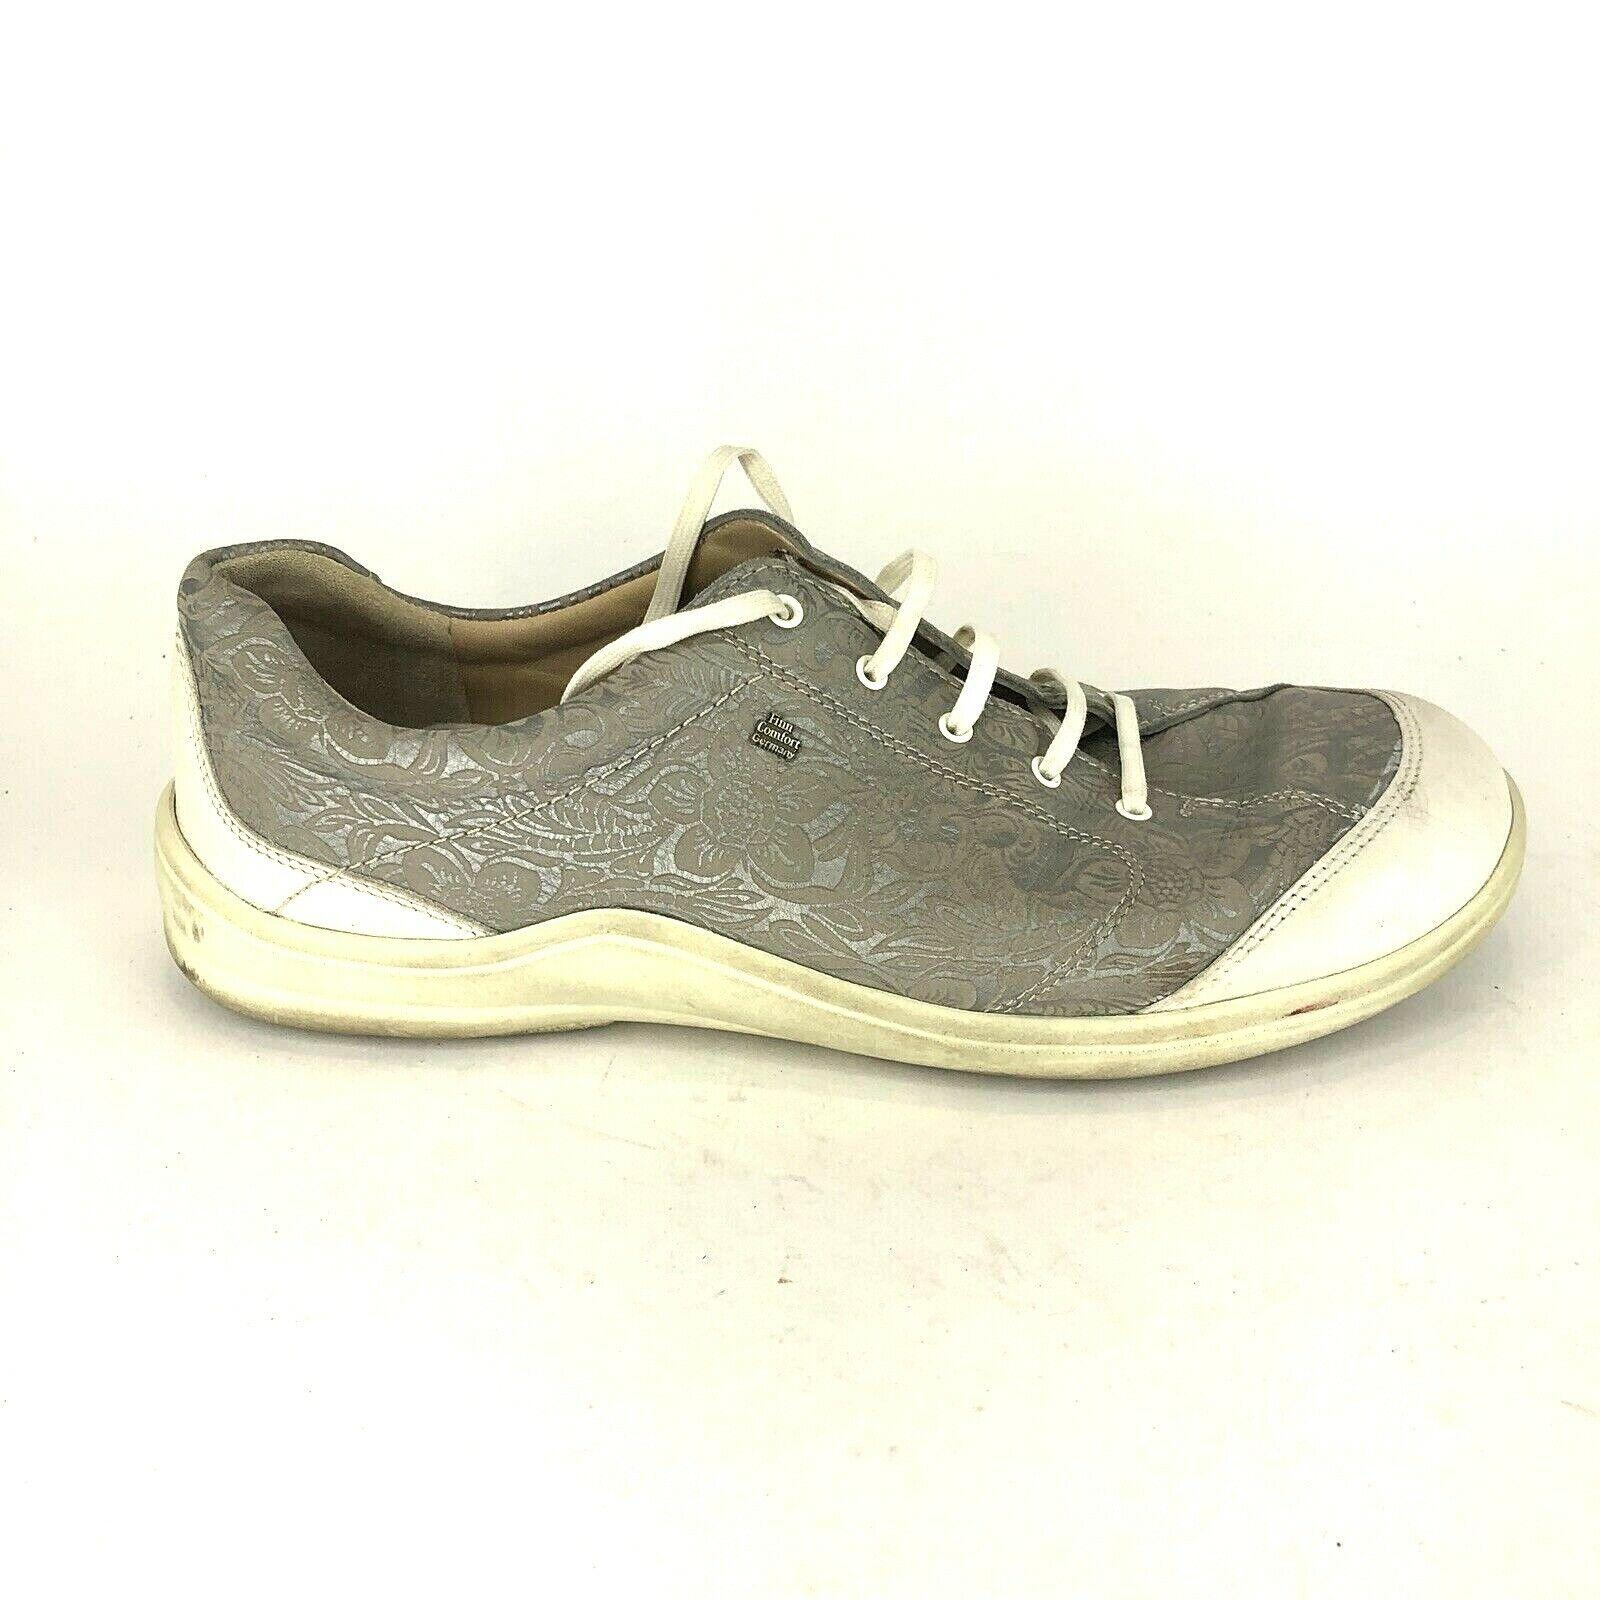 Finn  Comfort donna Dimensione 42 Pelle metallica in argentoo Pelle in pelle Floral Print scarpe da ginnastica  liquidazione fino al 70%